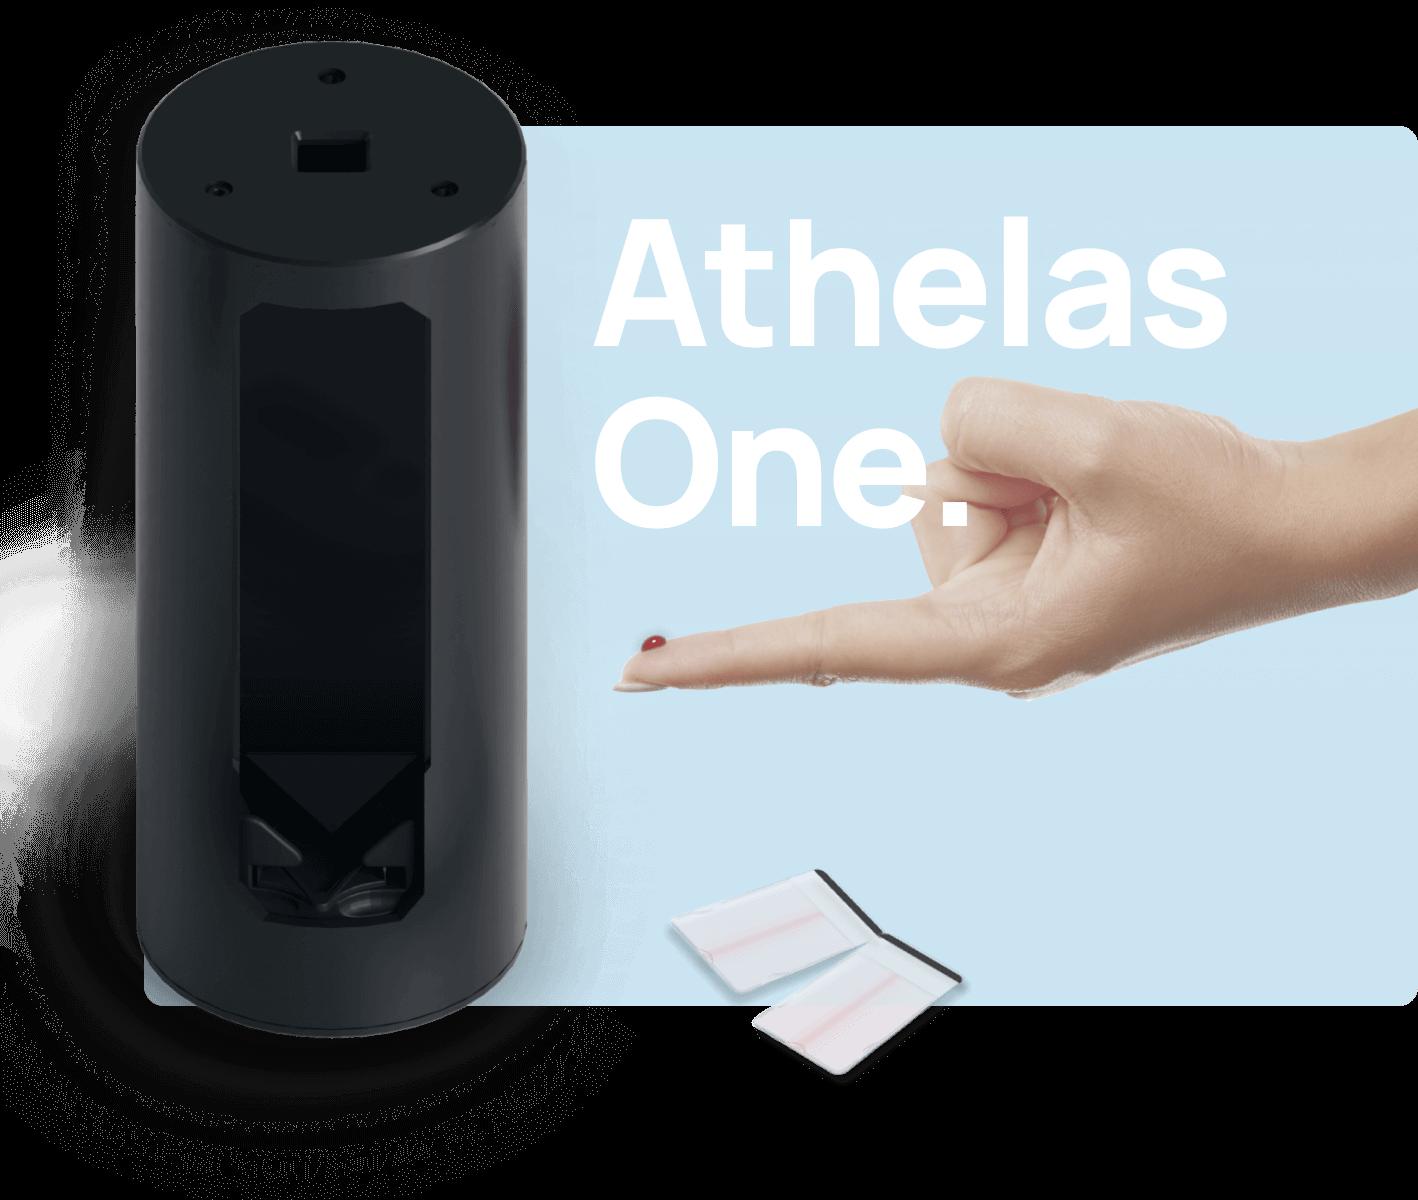 Athelas One